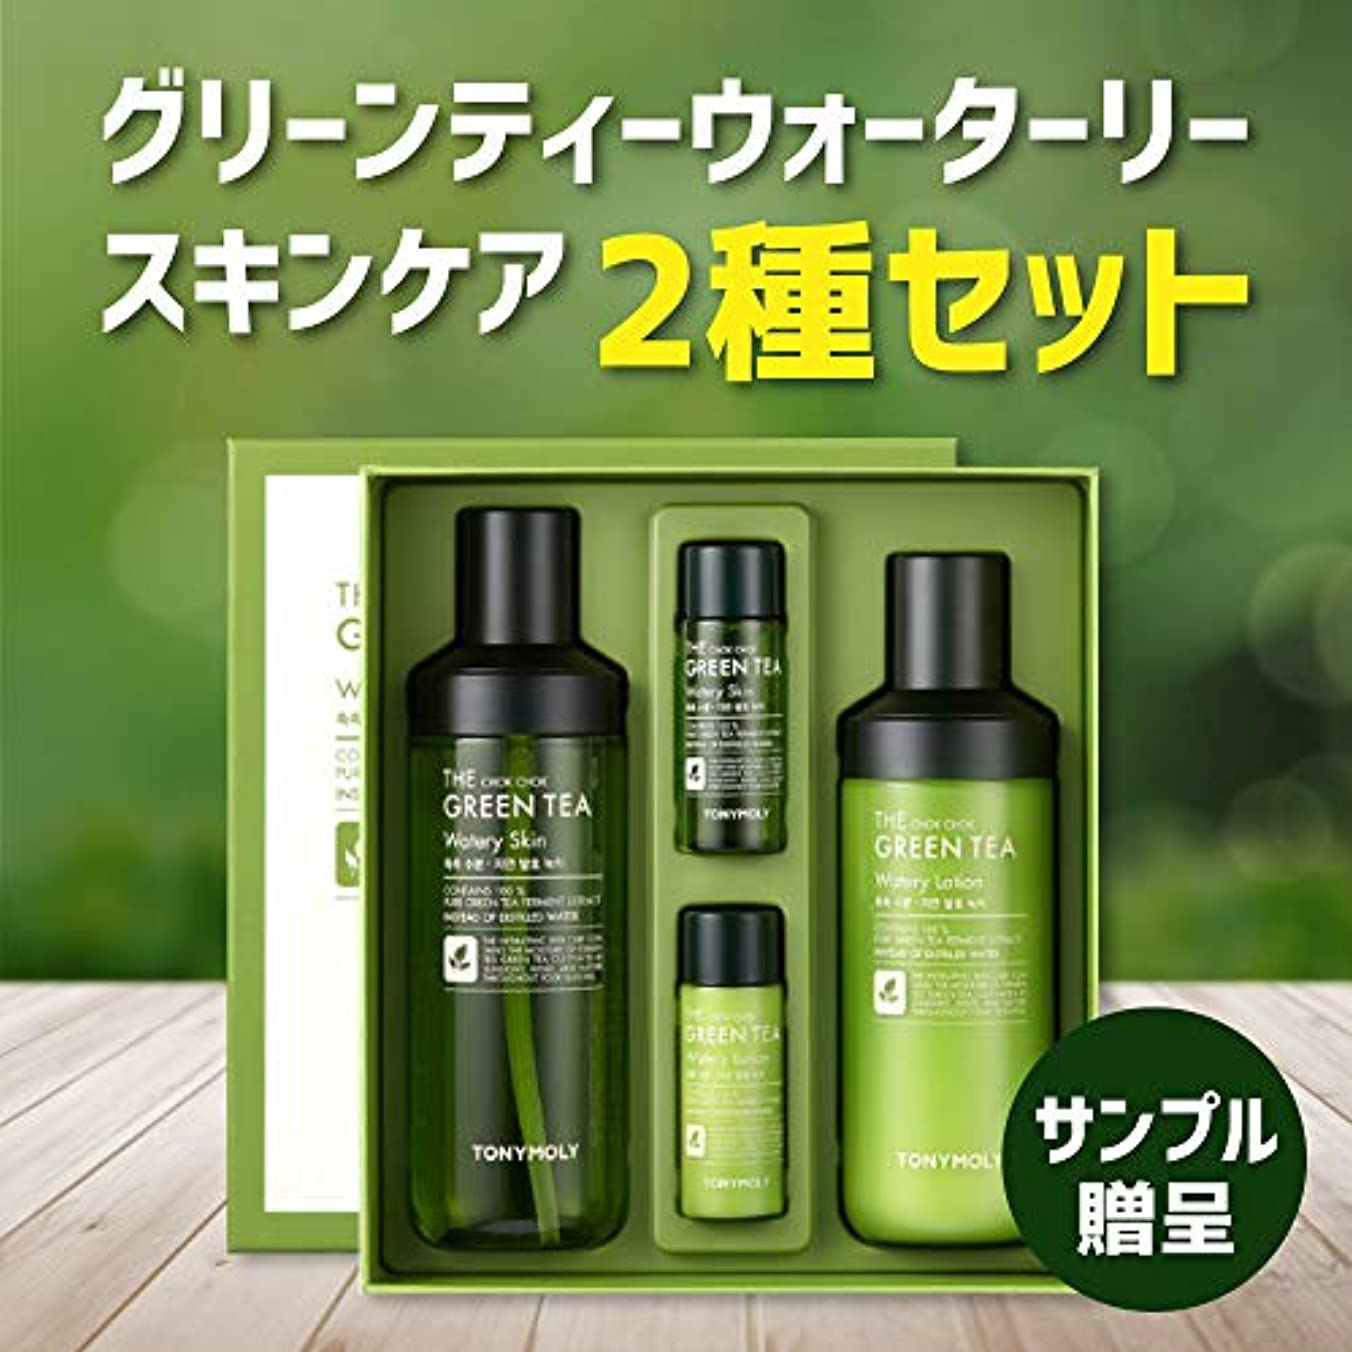 TONYMOLY しっとり グリーン ティー 水分 化粧水 乳液 セット 抹茶 The Chok Chok Green Tea Watery Skin